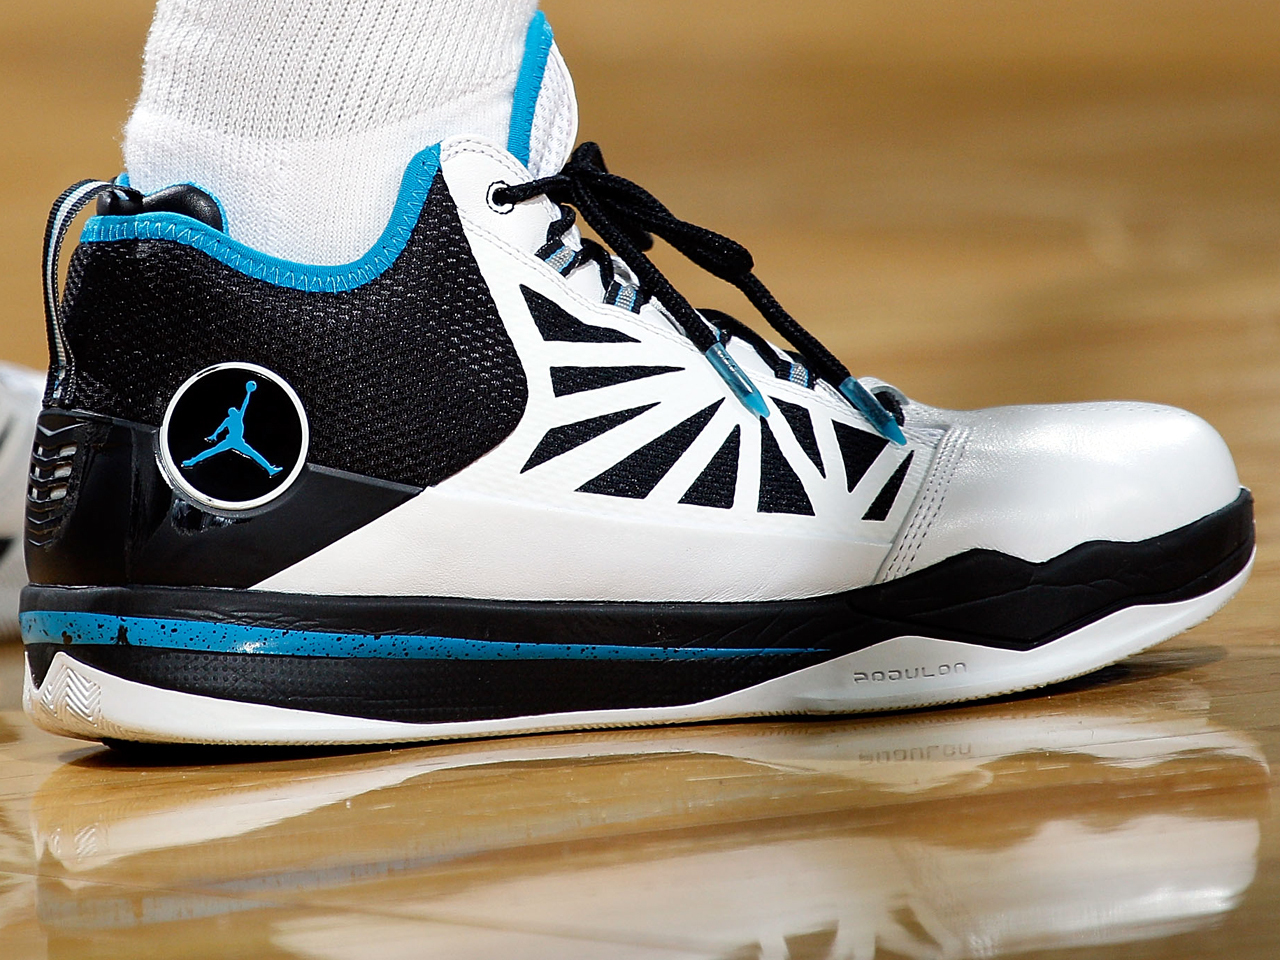 4d0d22b39ae Six-fingered Jordan logo reveals fake Nikes - CBS News